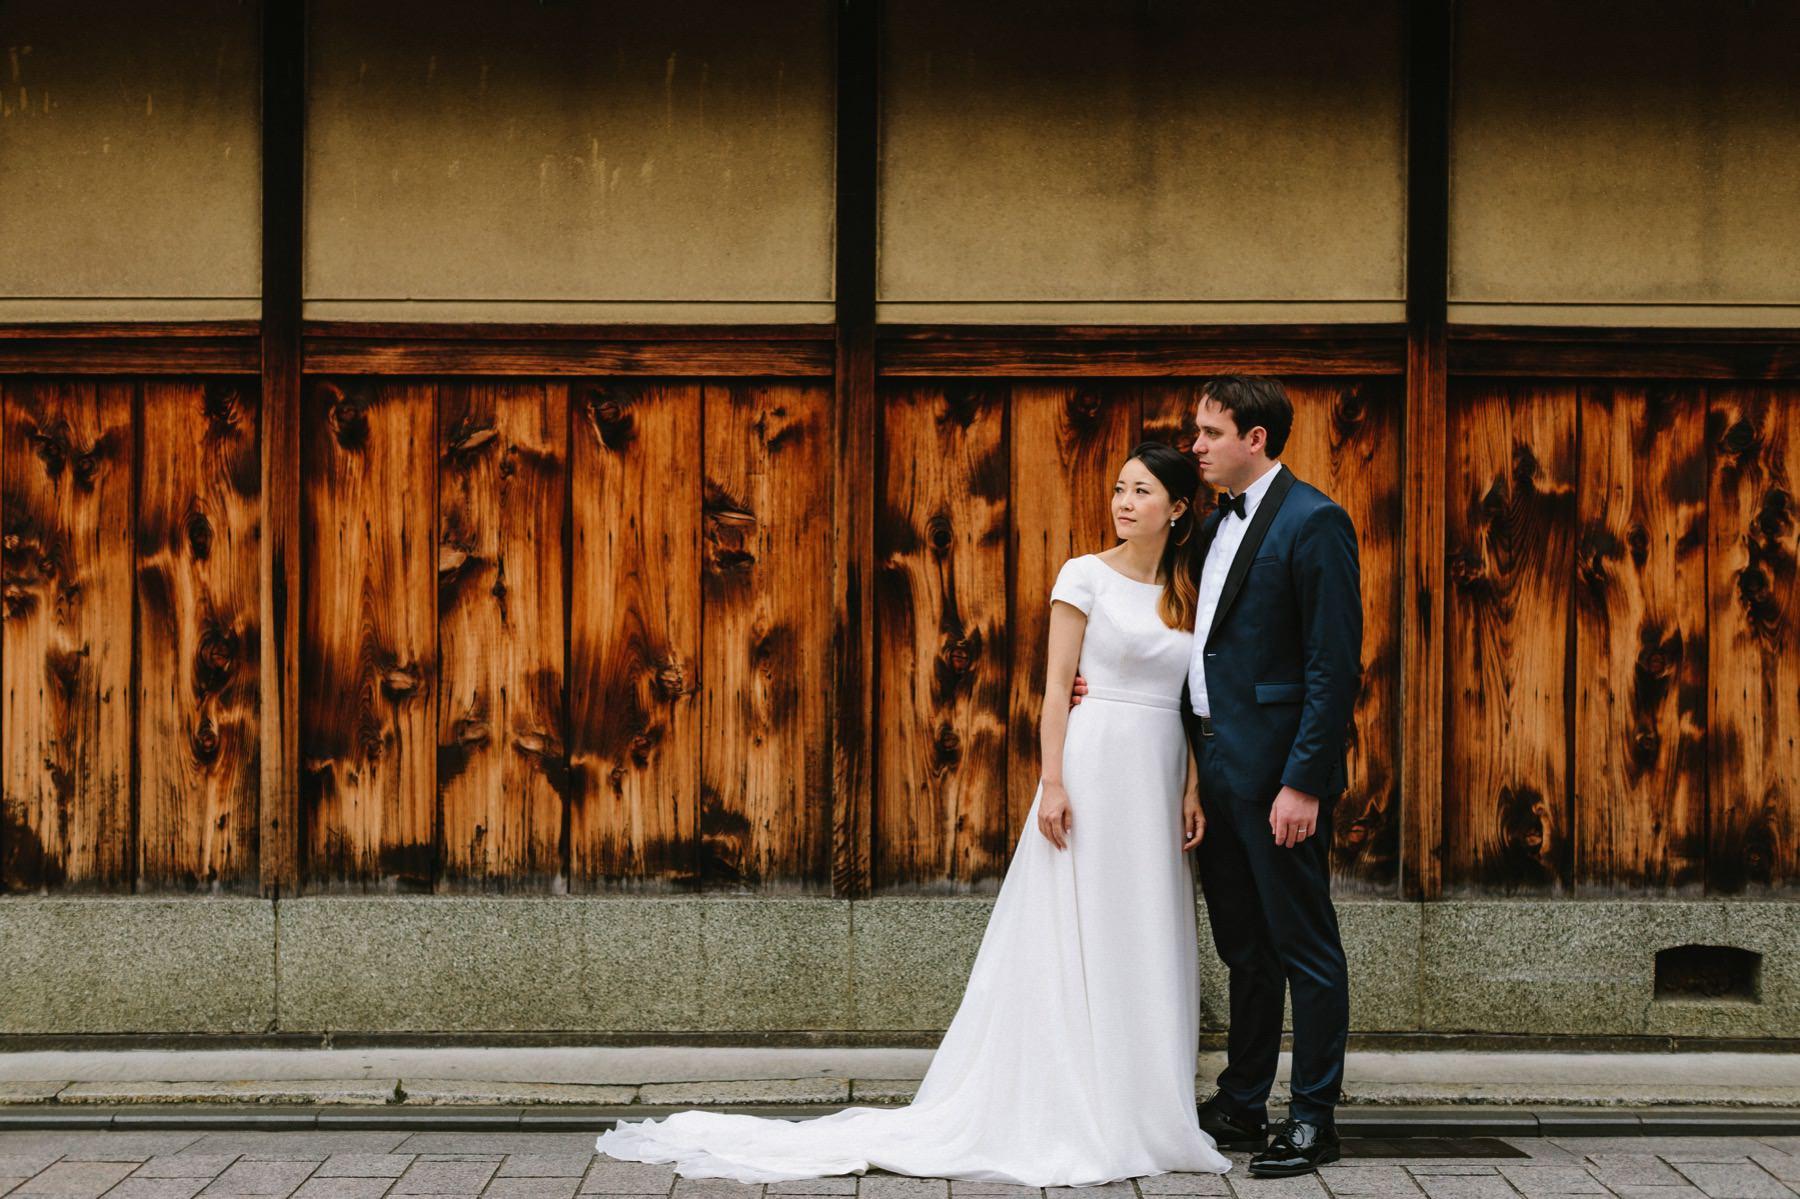 Gion Kyoto pre wedding photo session